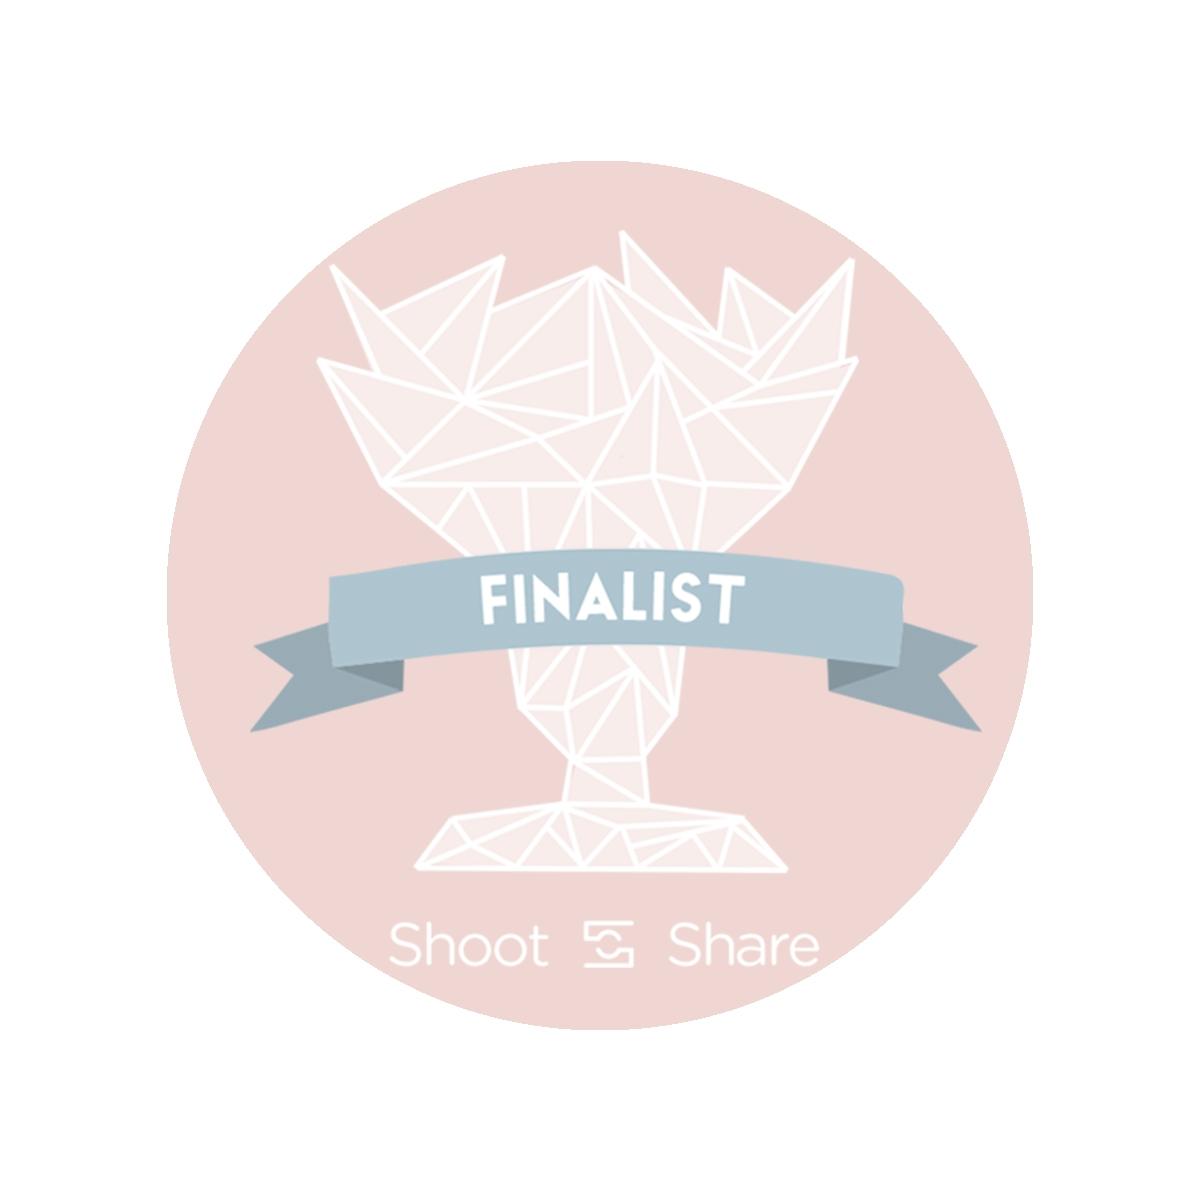 Shoot & Share Finalist in 2017